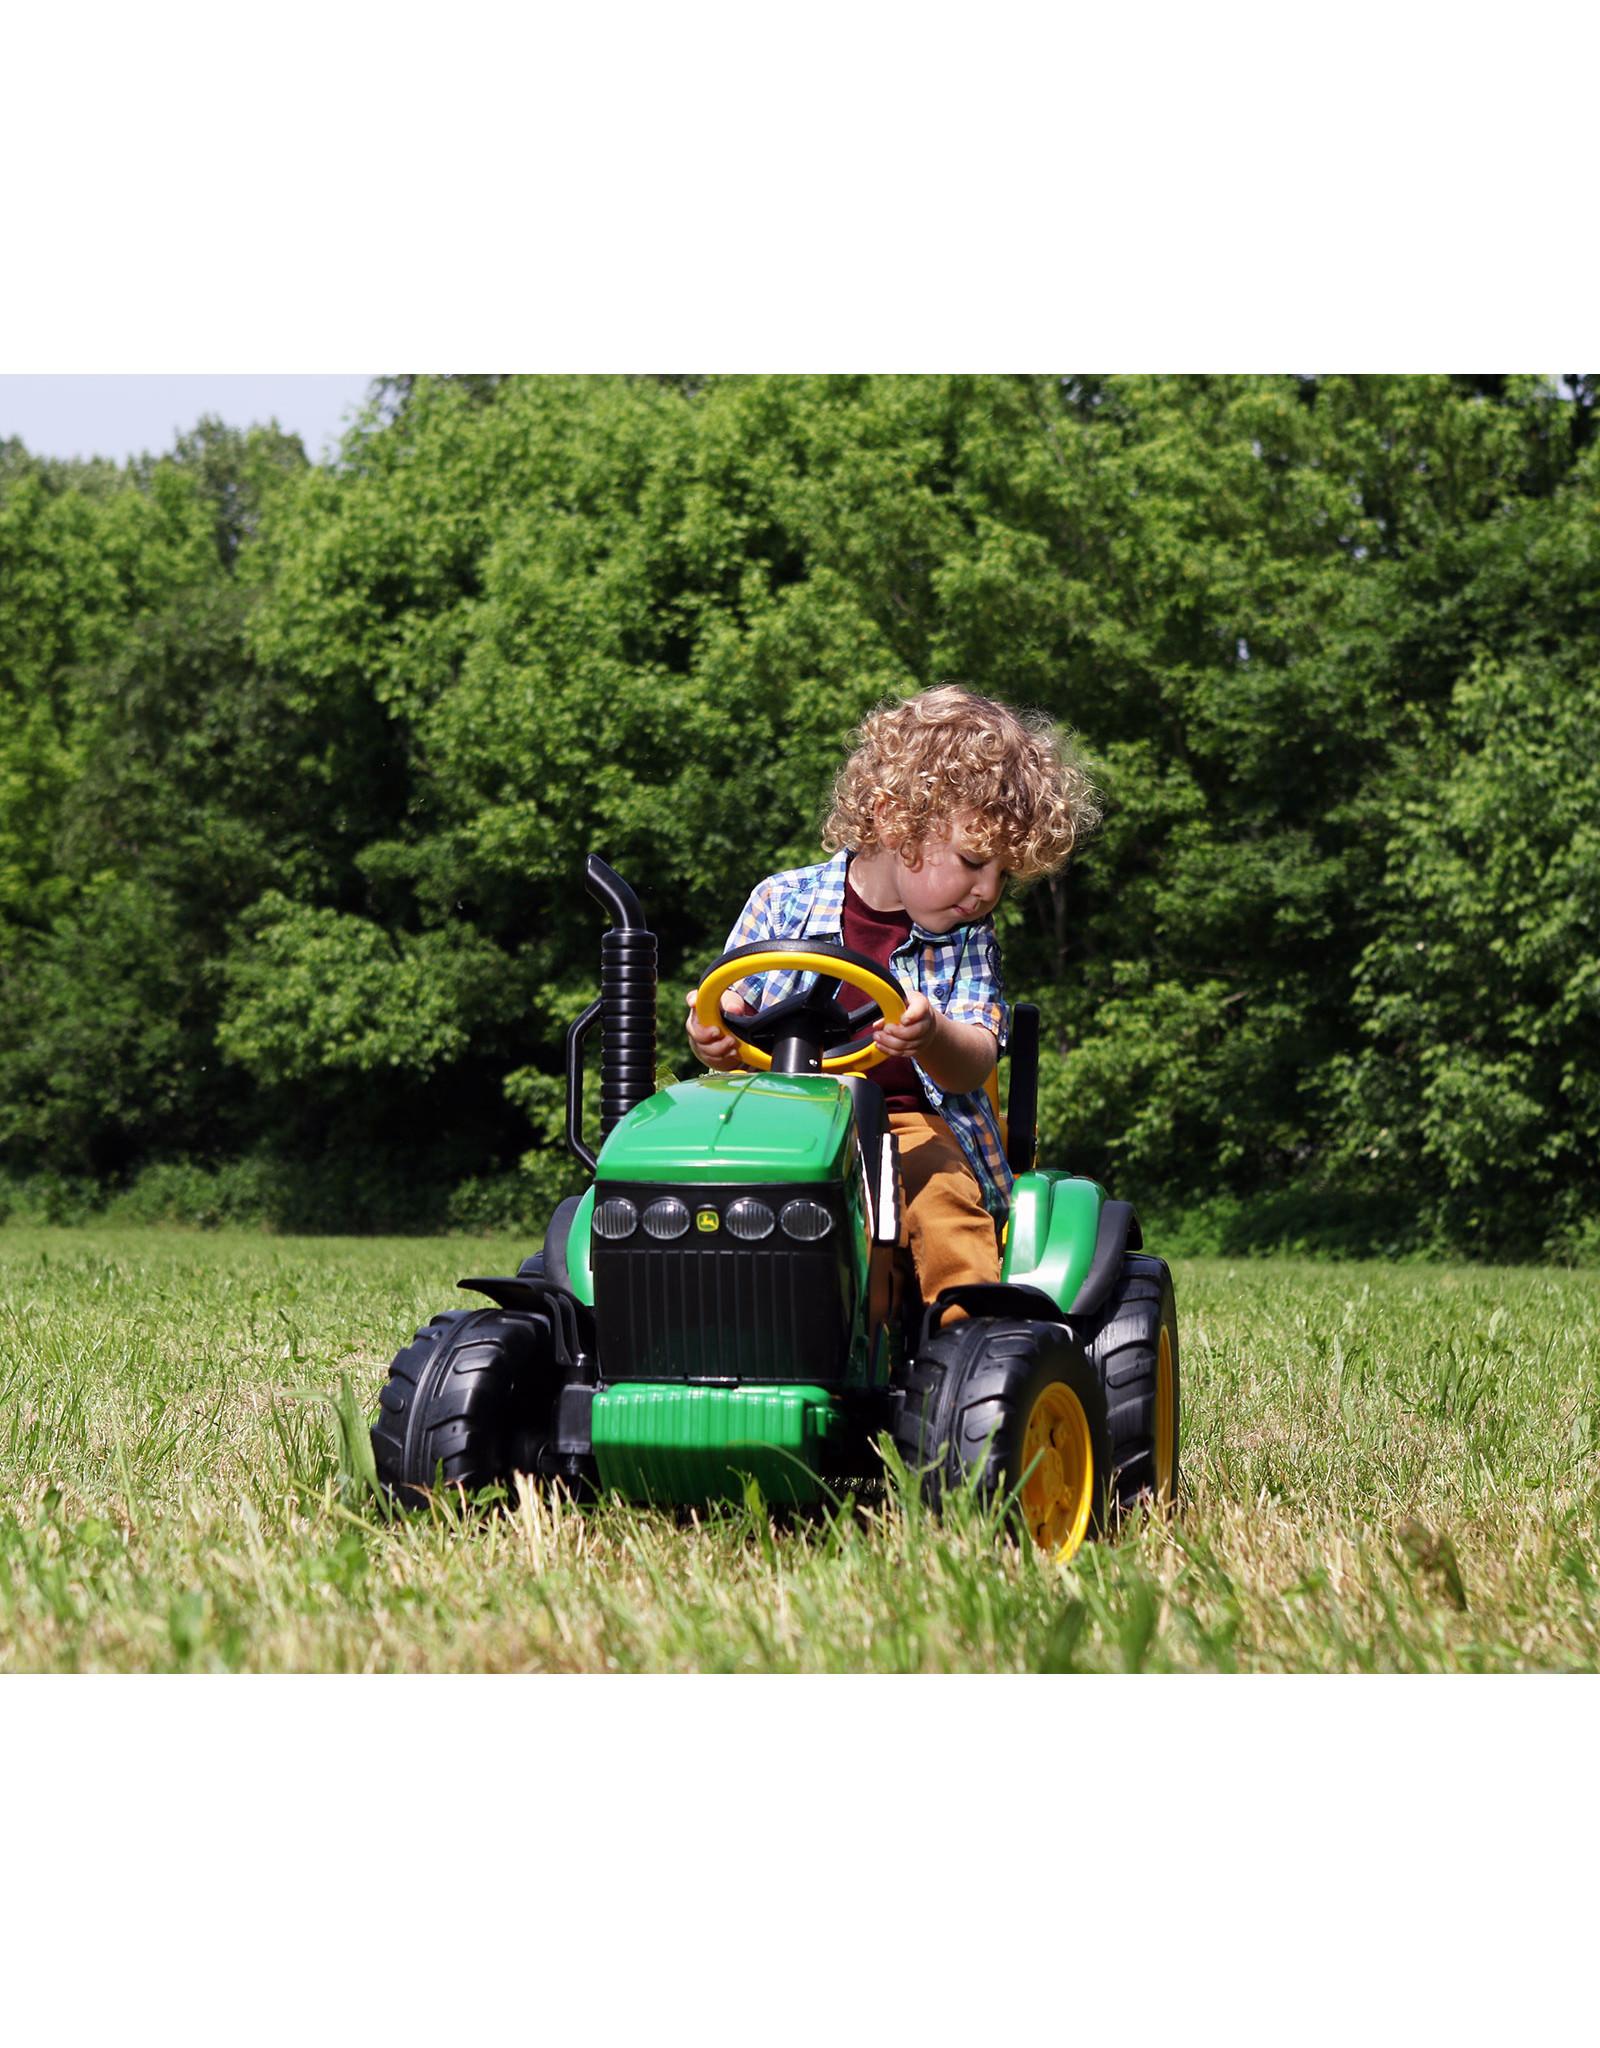 Peg Perego John Deere Ground Force Tractor & Trailer